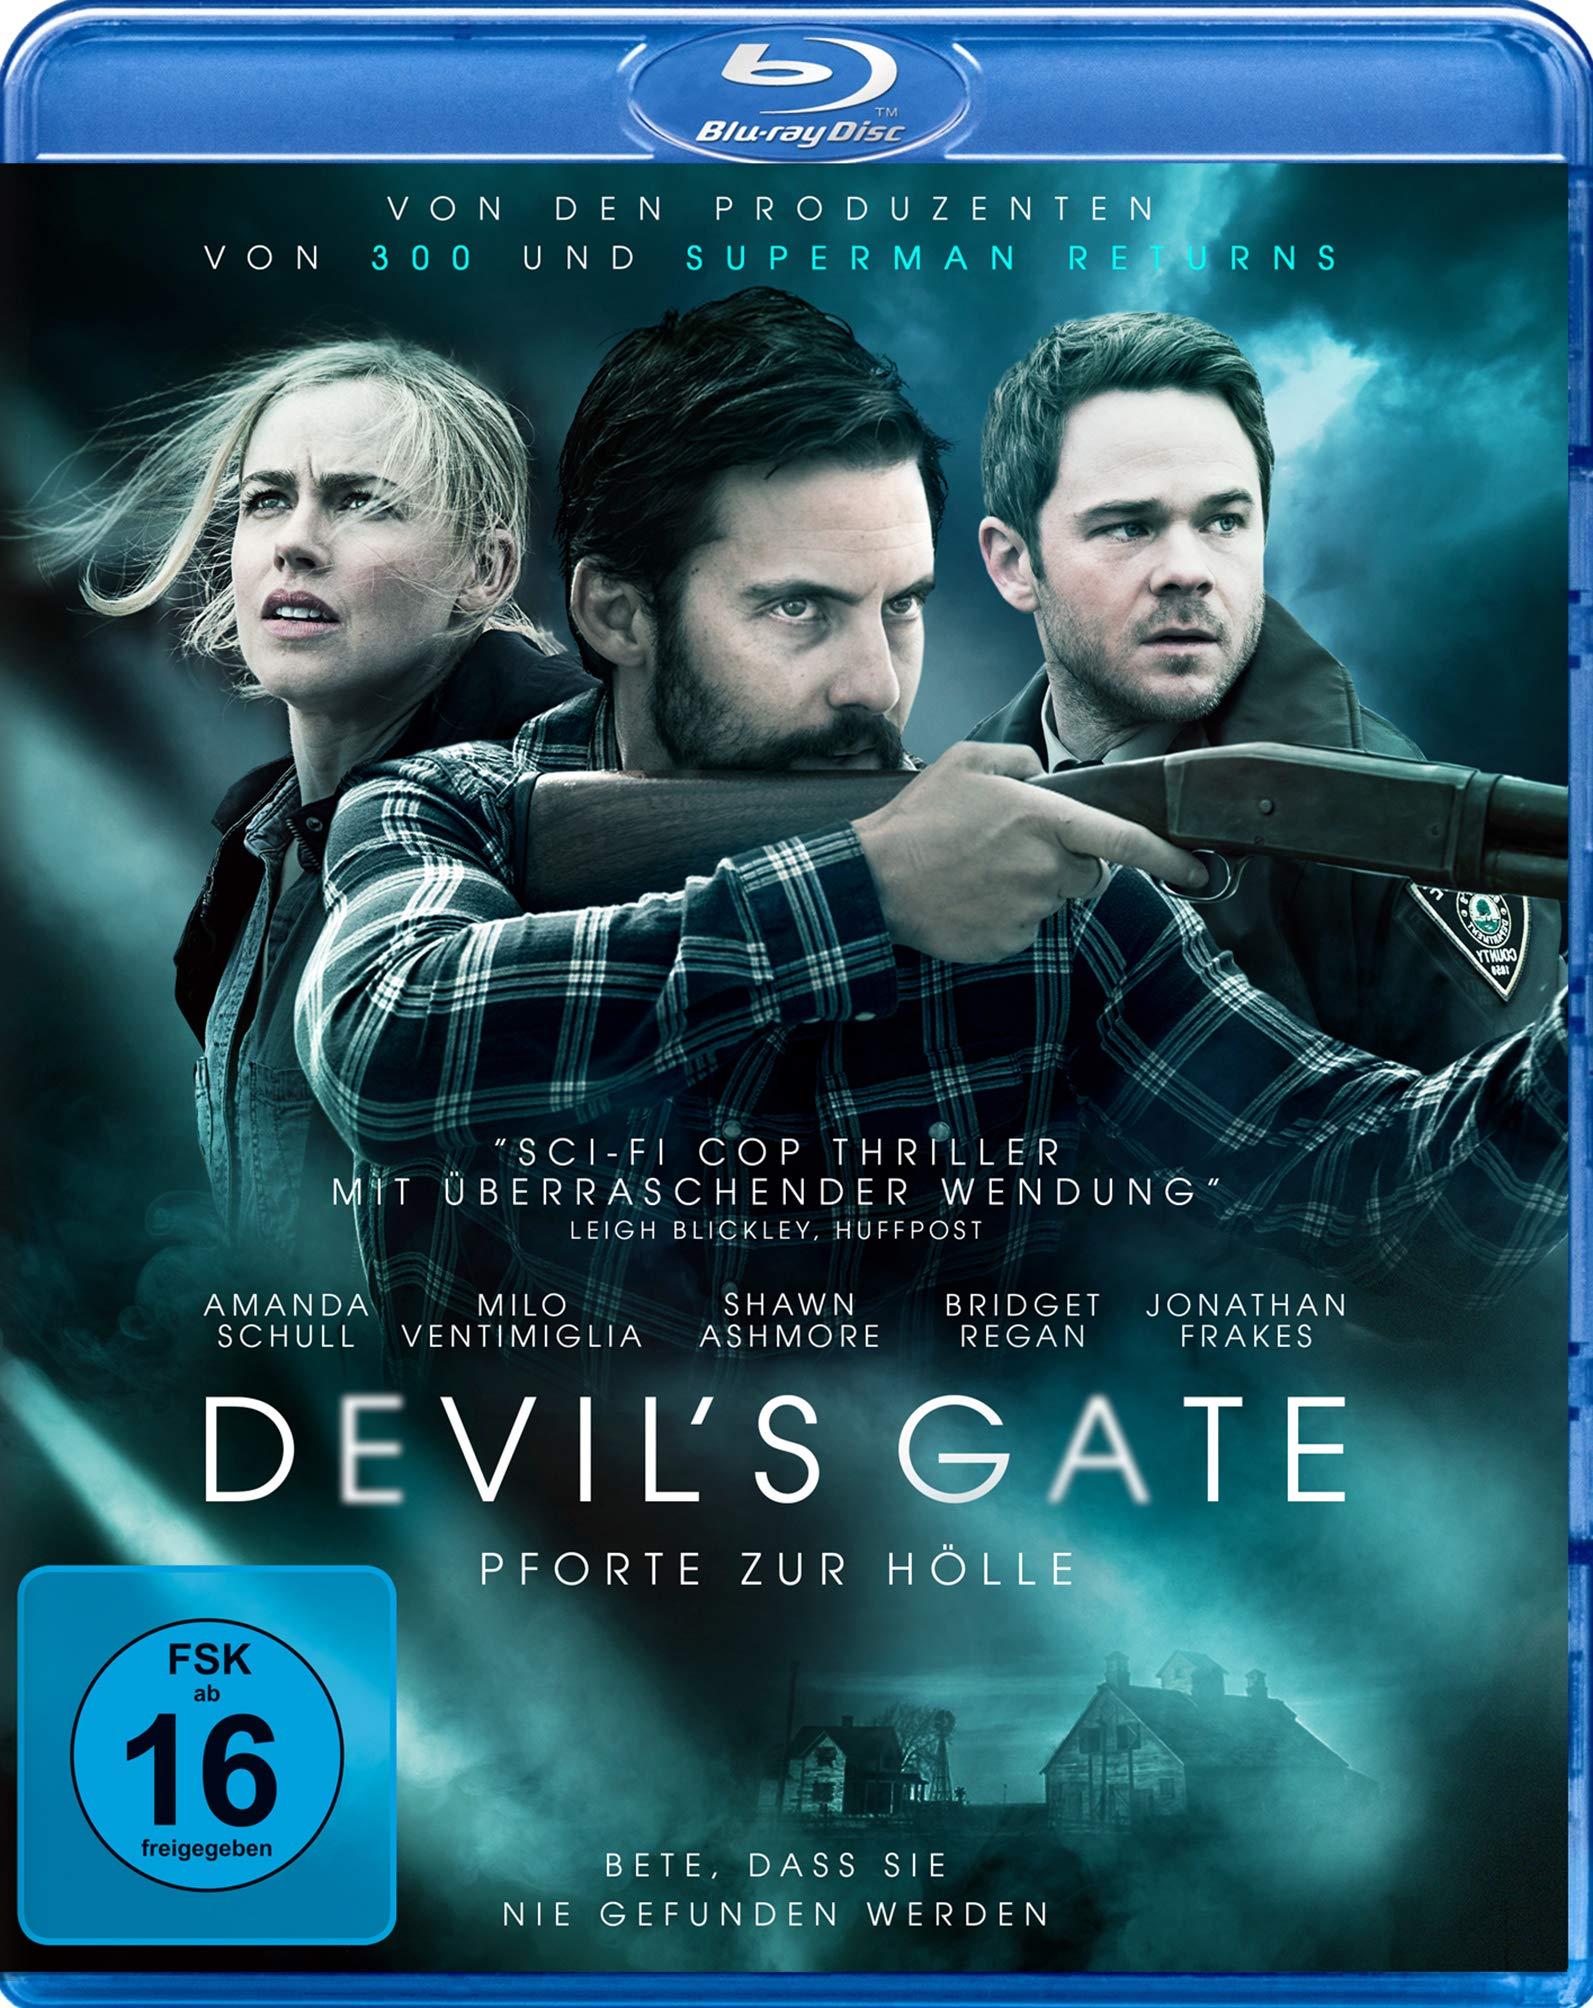 download Devils.Gate.Pforte.zur.Hoelle.2017.German.DL.1080p.BluRay.x264-ENCOUNTERS